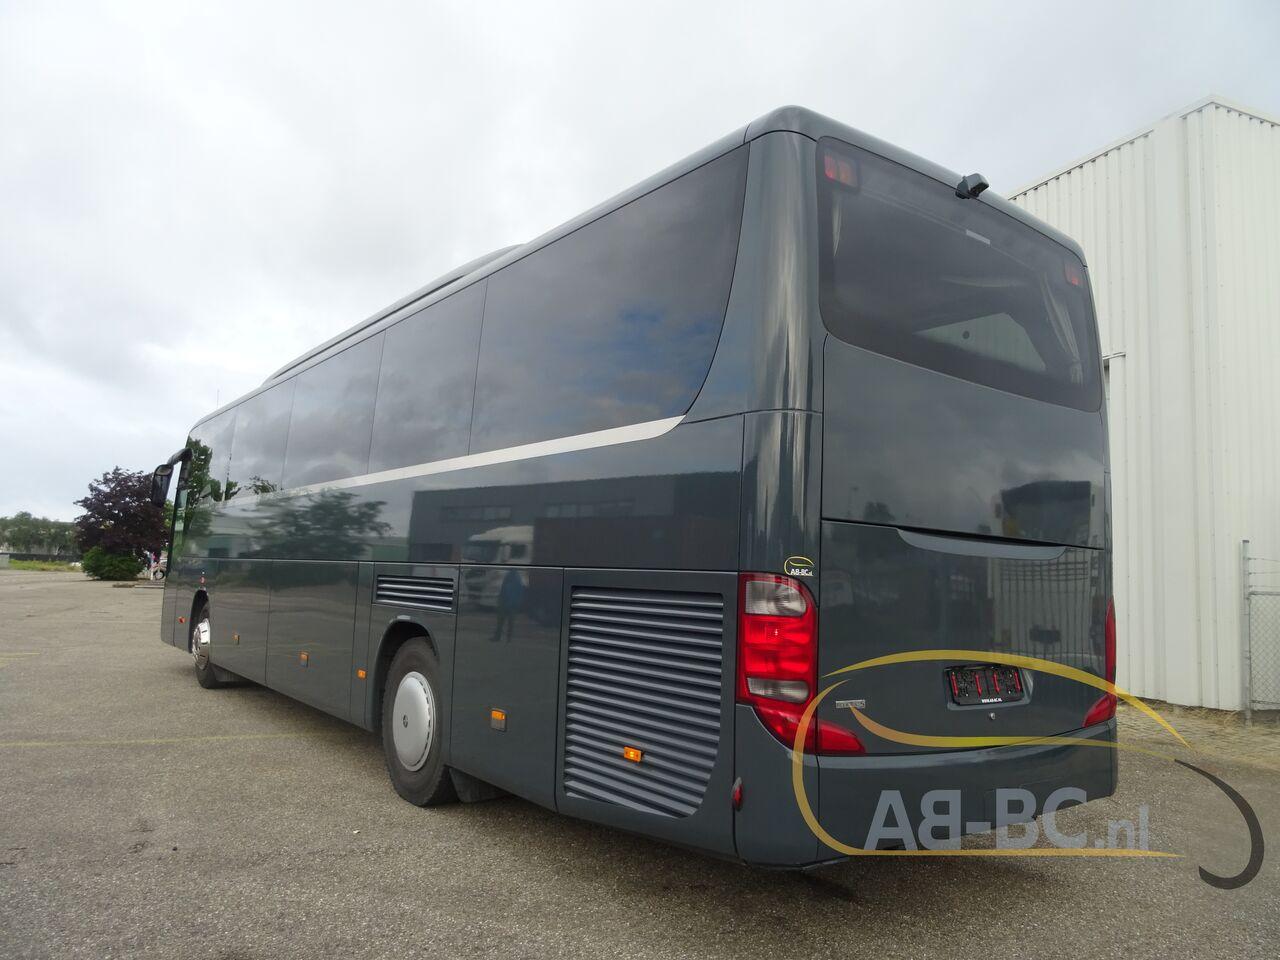 coach-busSETRA-S415-GT-HD-FINAL-EDITION---1627457026381366925_big_e898872ce29a343e117f6a2cc24df9b1--21050713010665719300